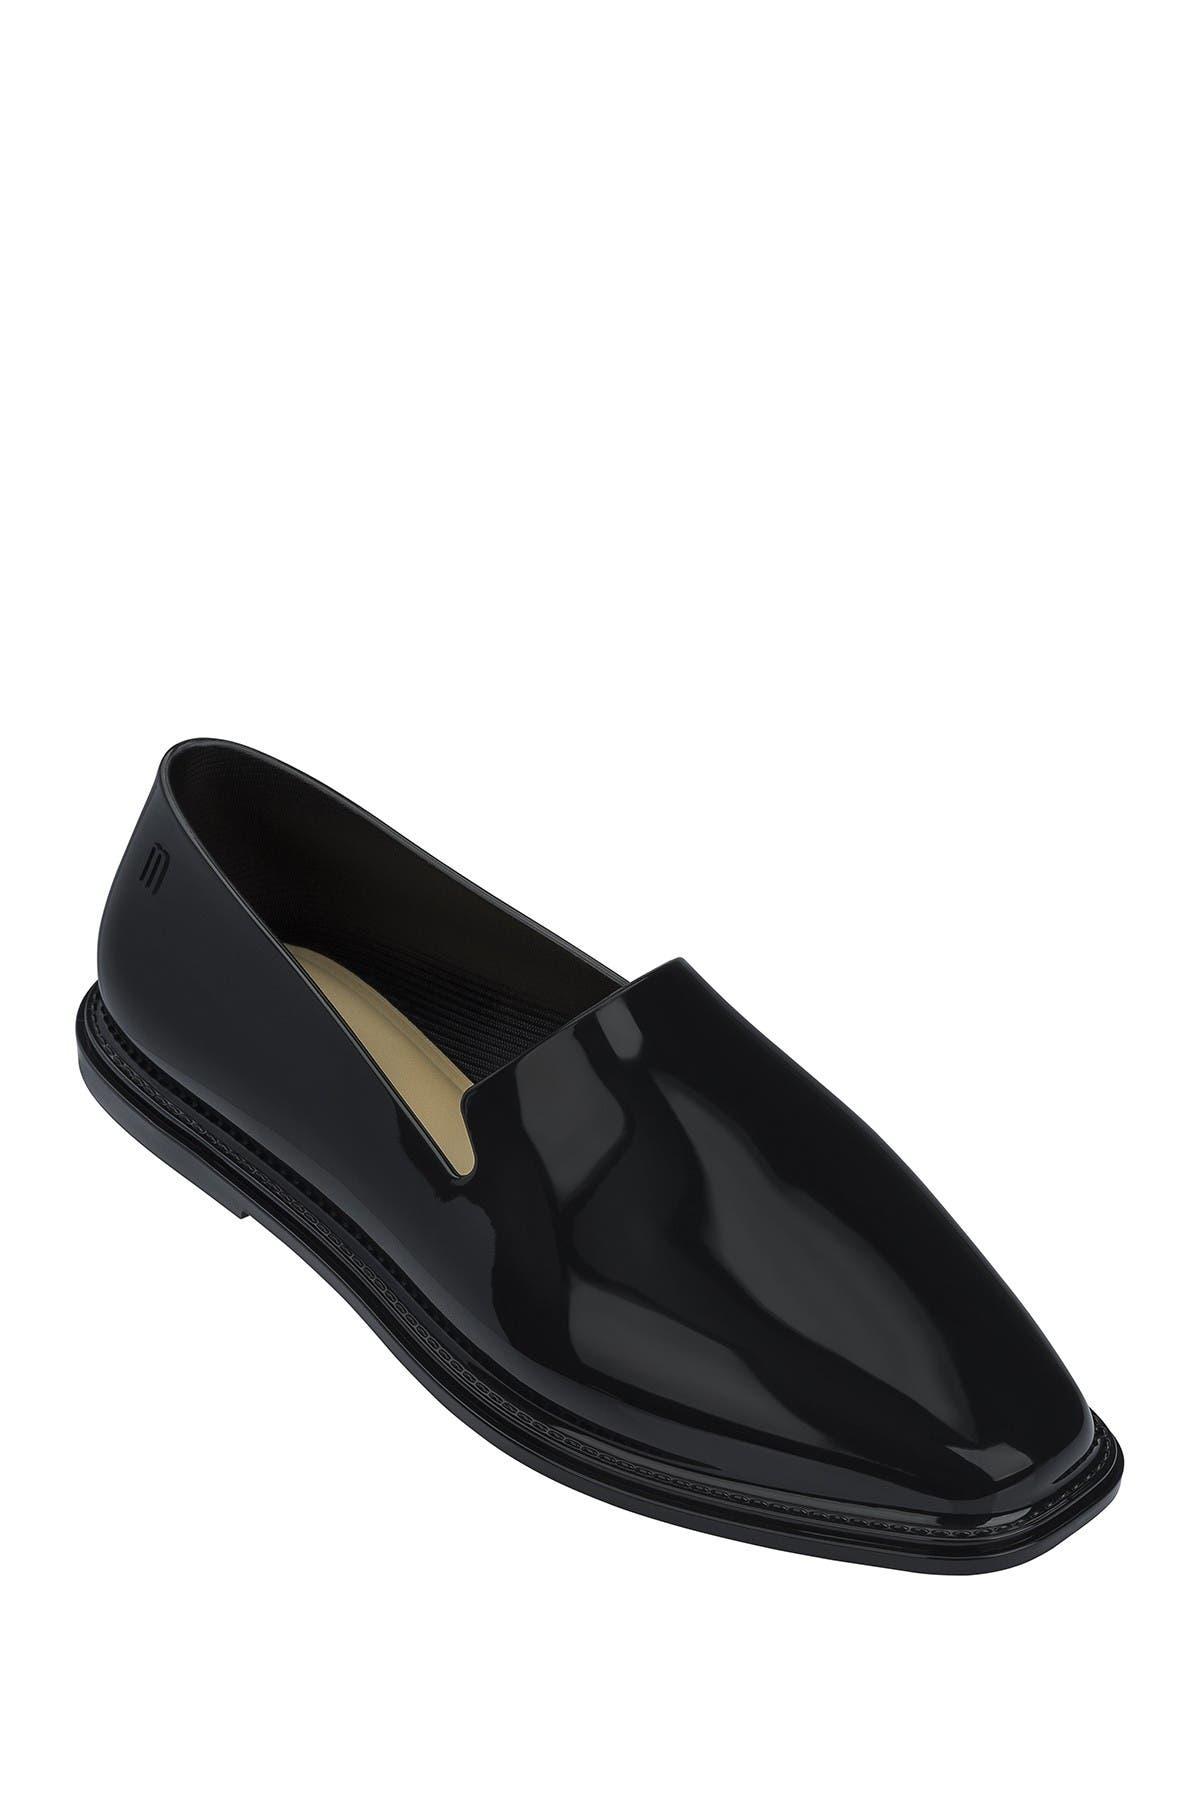 Melissa Women's Shoes | Nordstrom Rack